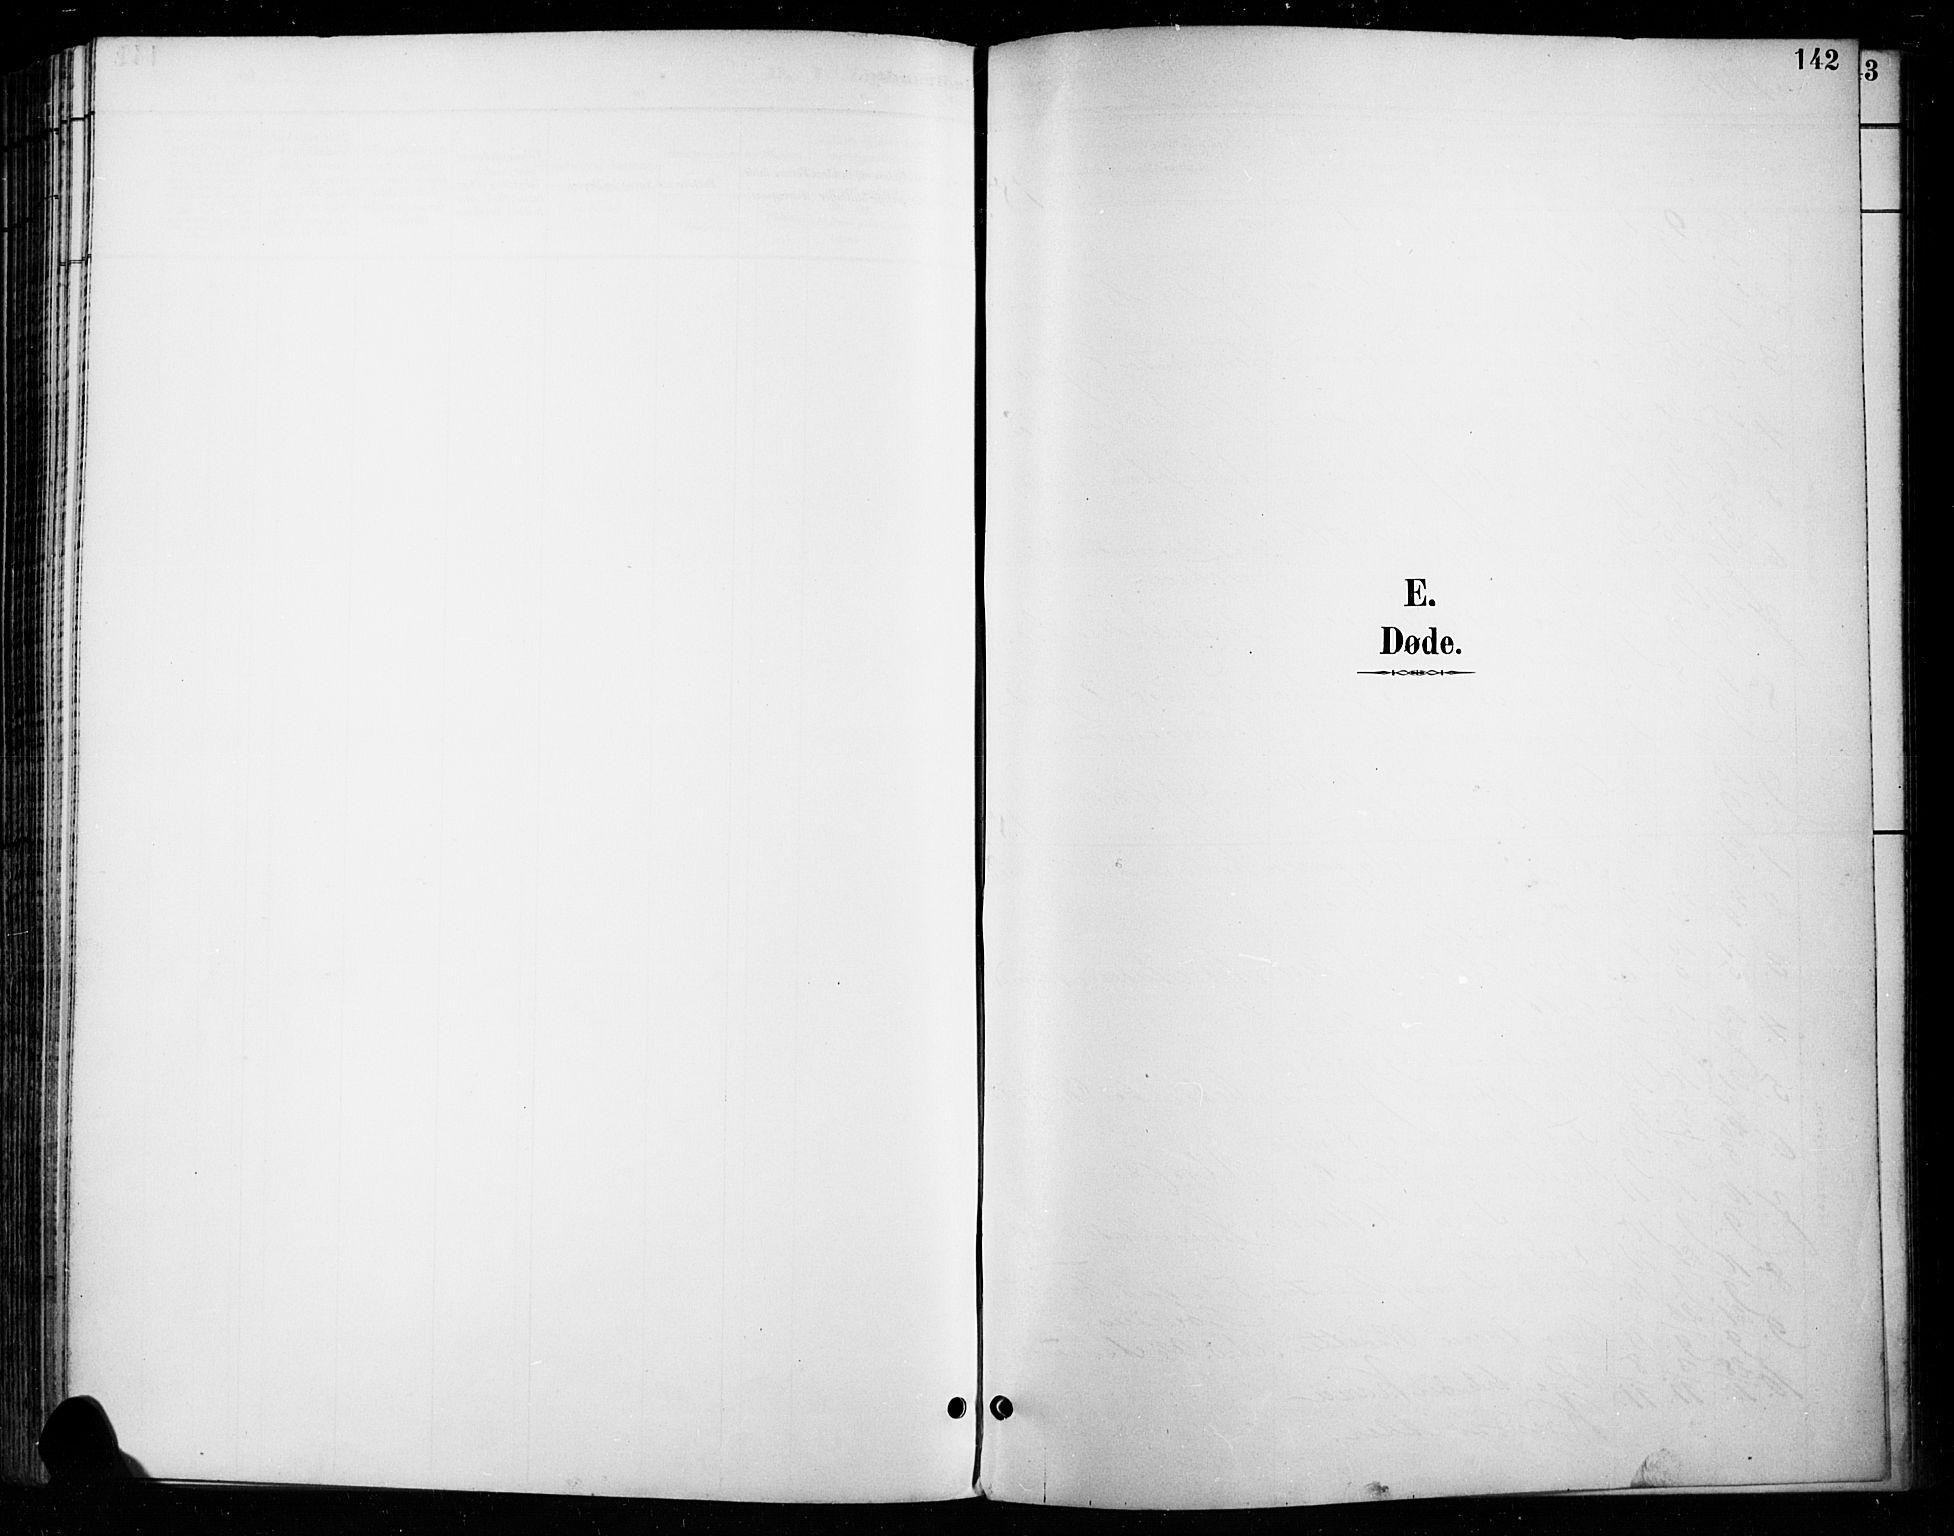 SAH, Vardal prestekontor, H/Ha/Haa/L0011: Ministerialbok nr. 11, 1891-1901, s. 142